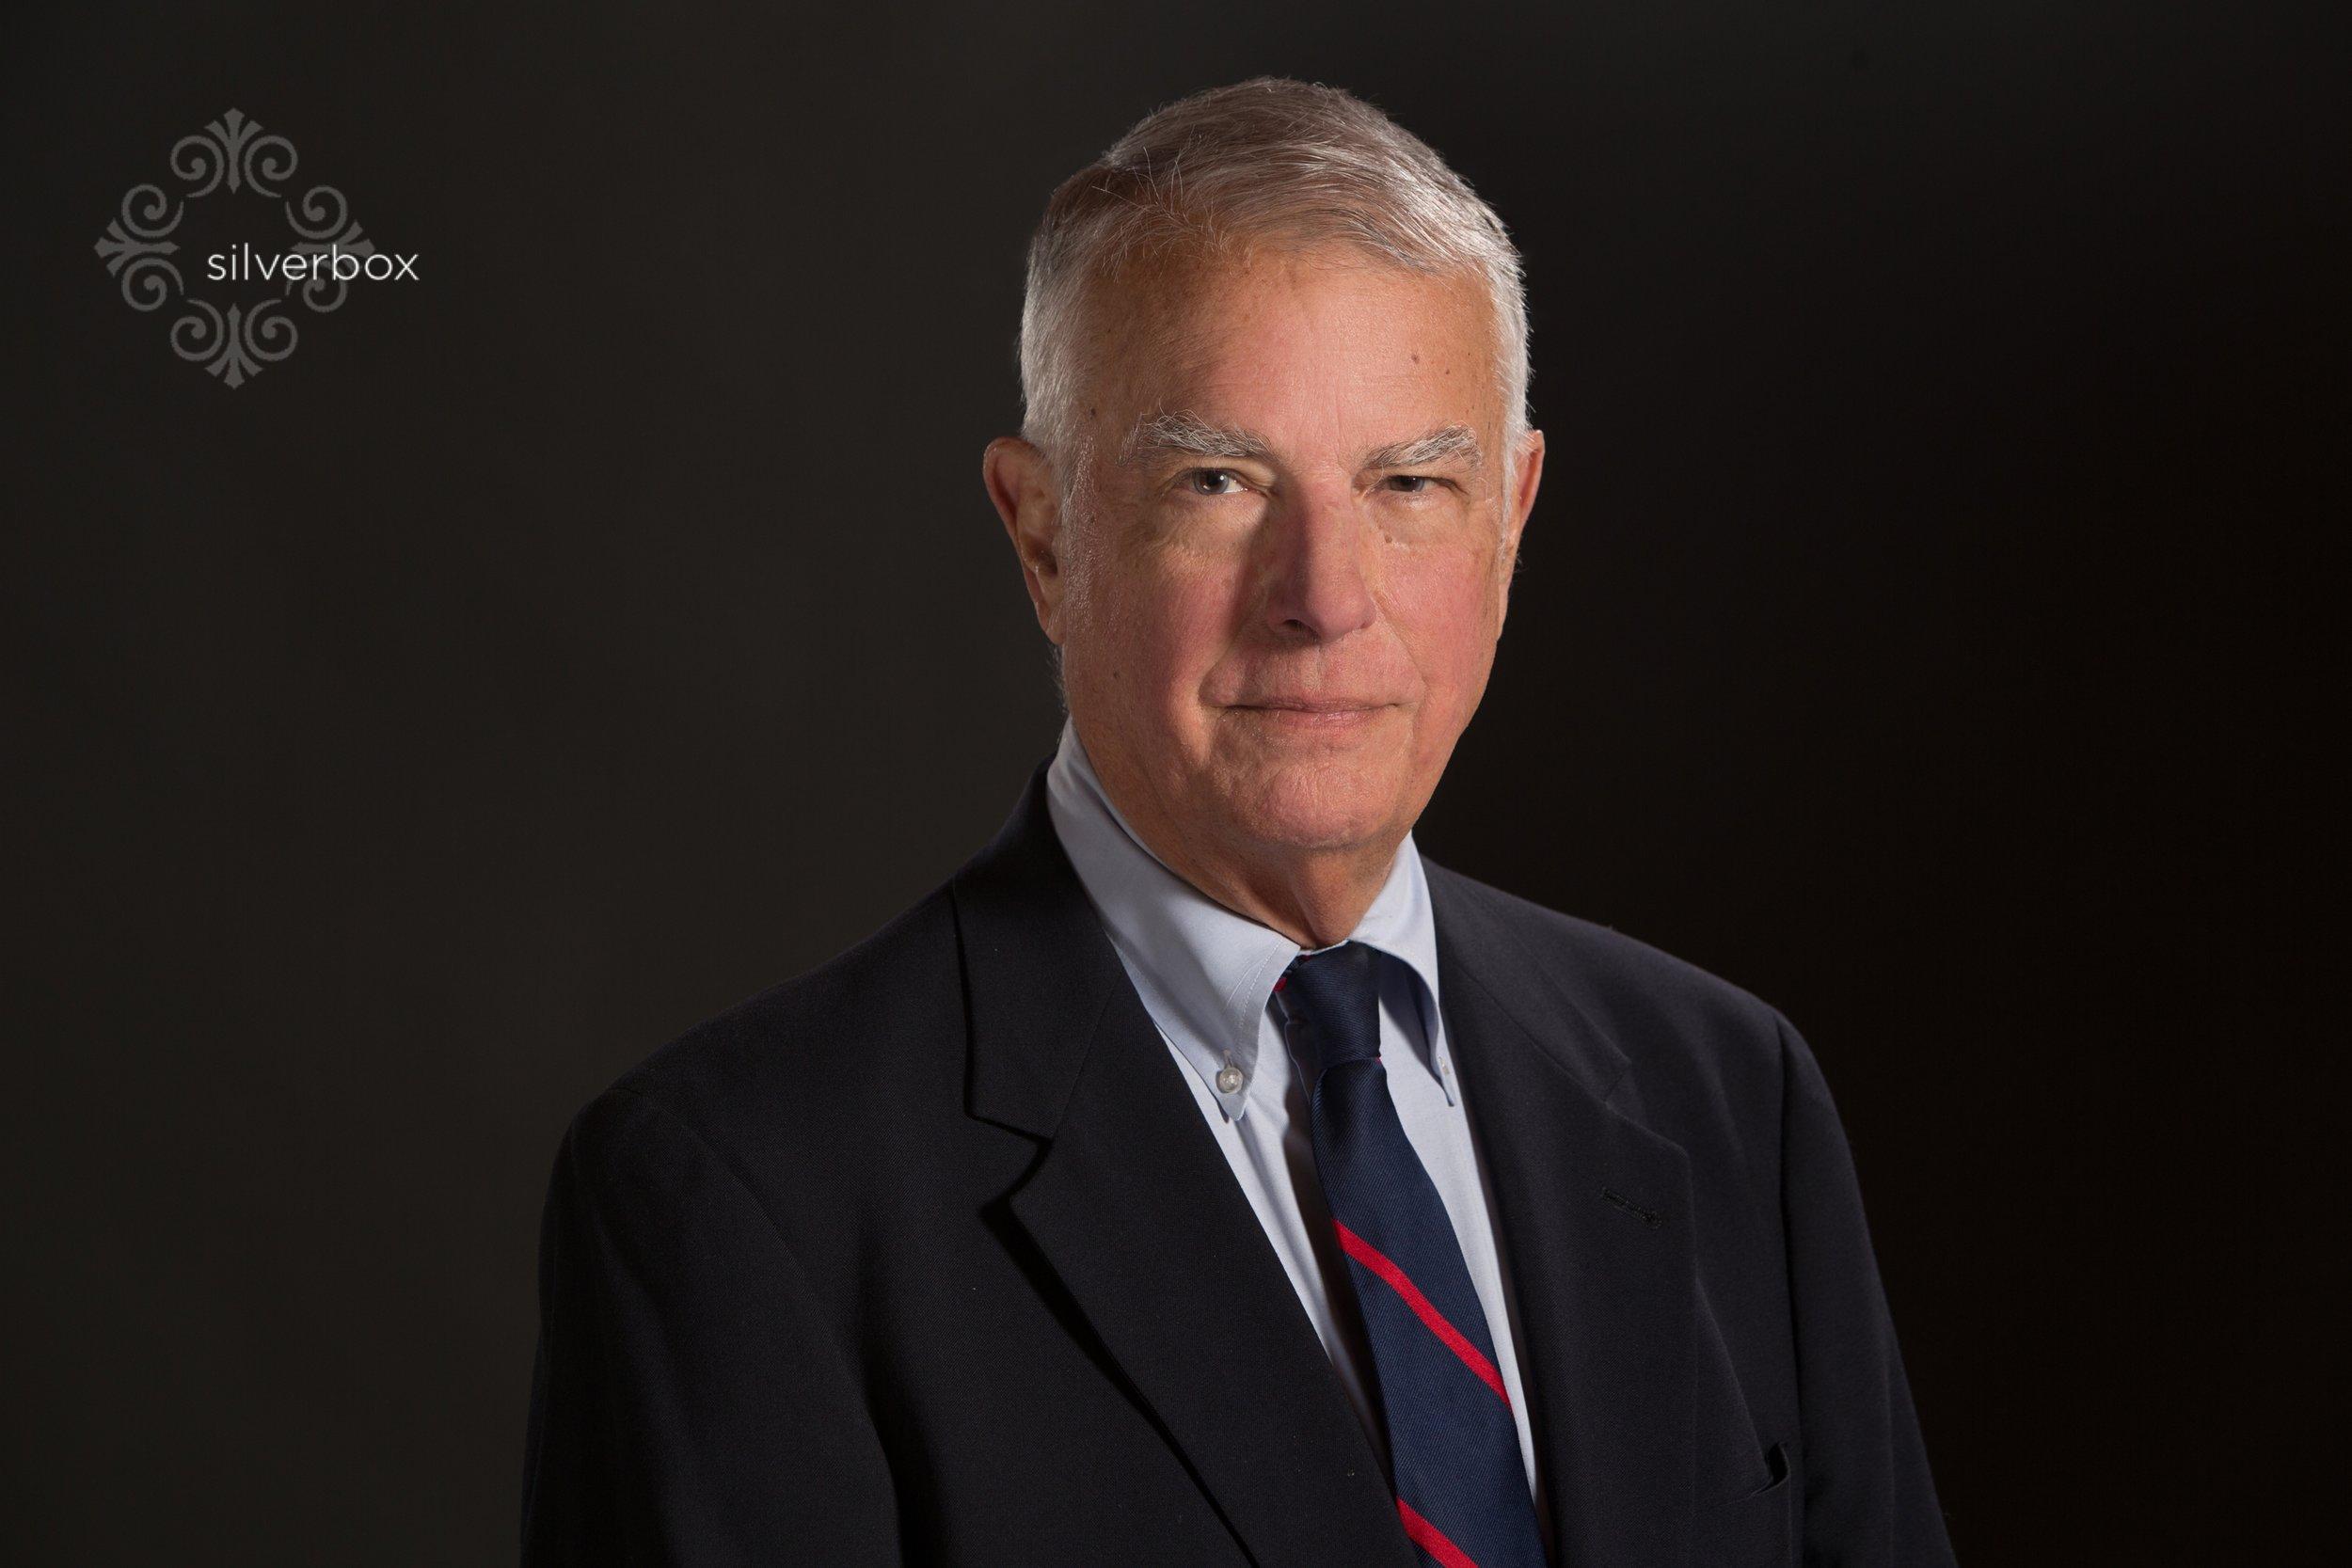 Dr. Bob Gaines, Orthopedic surgeon and international speaker